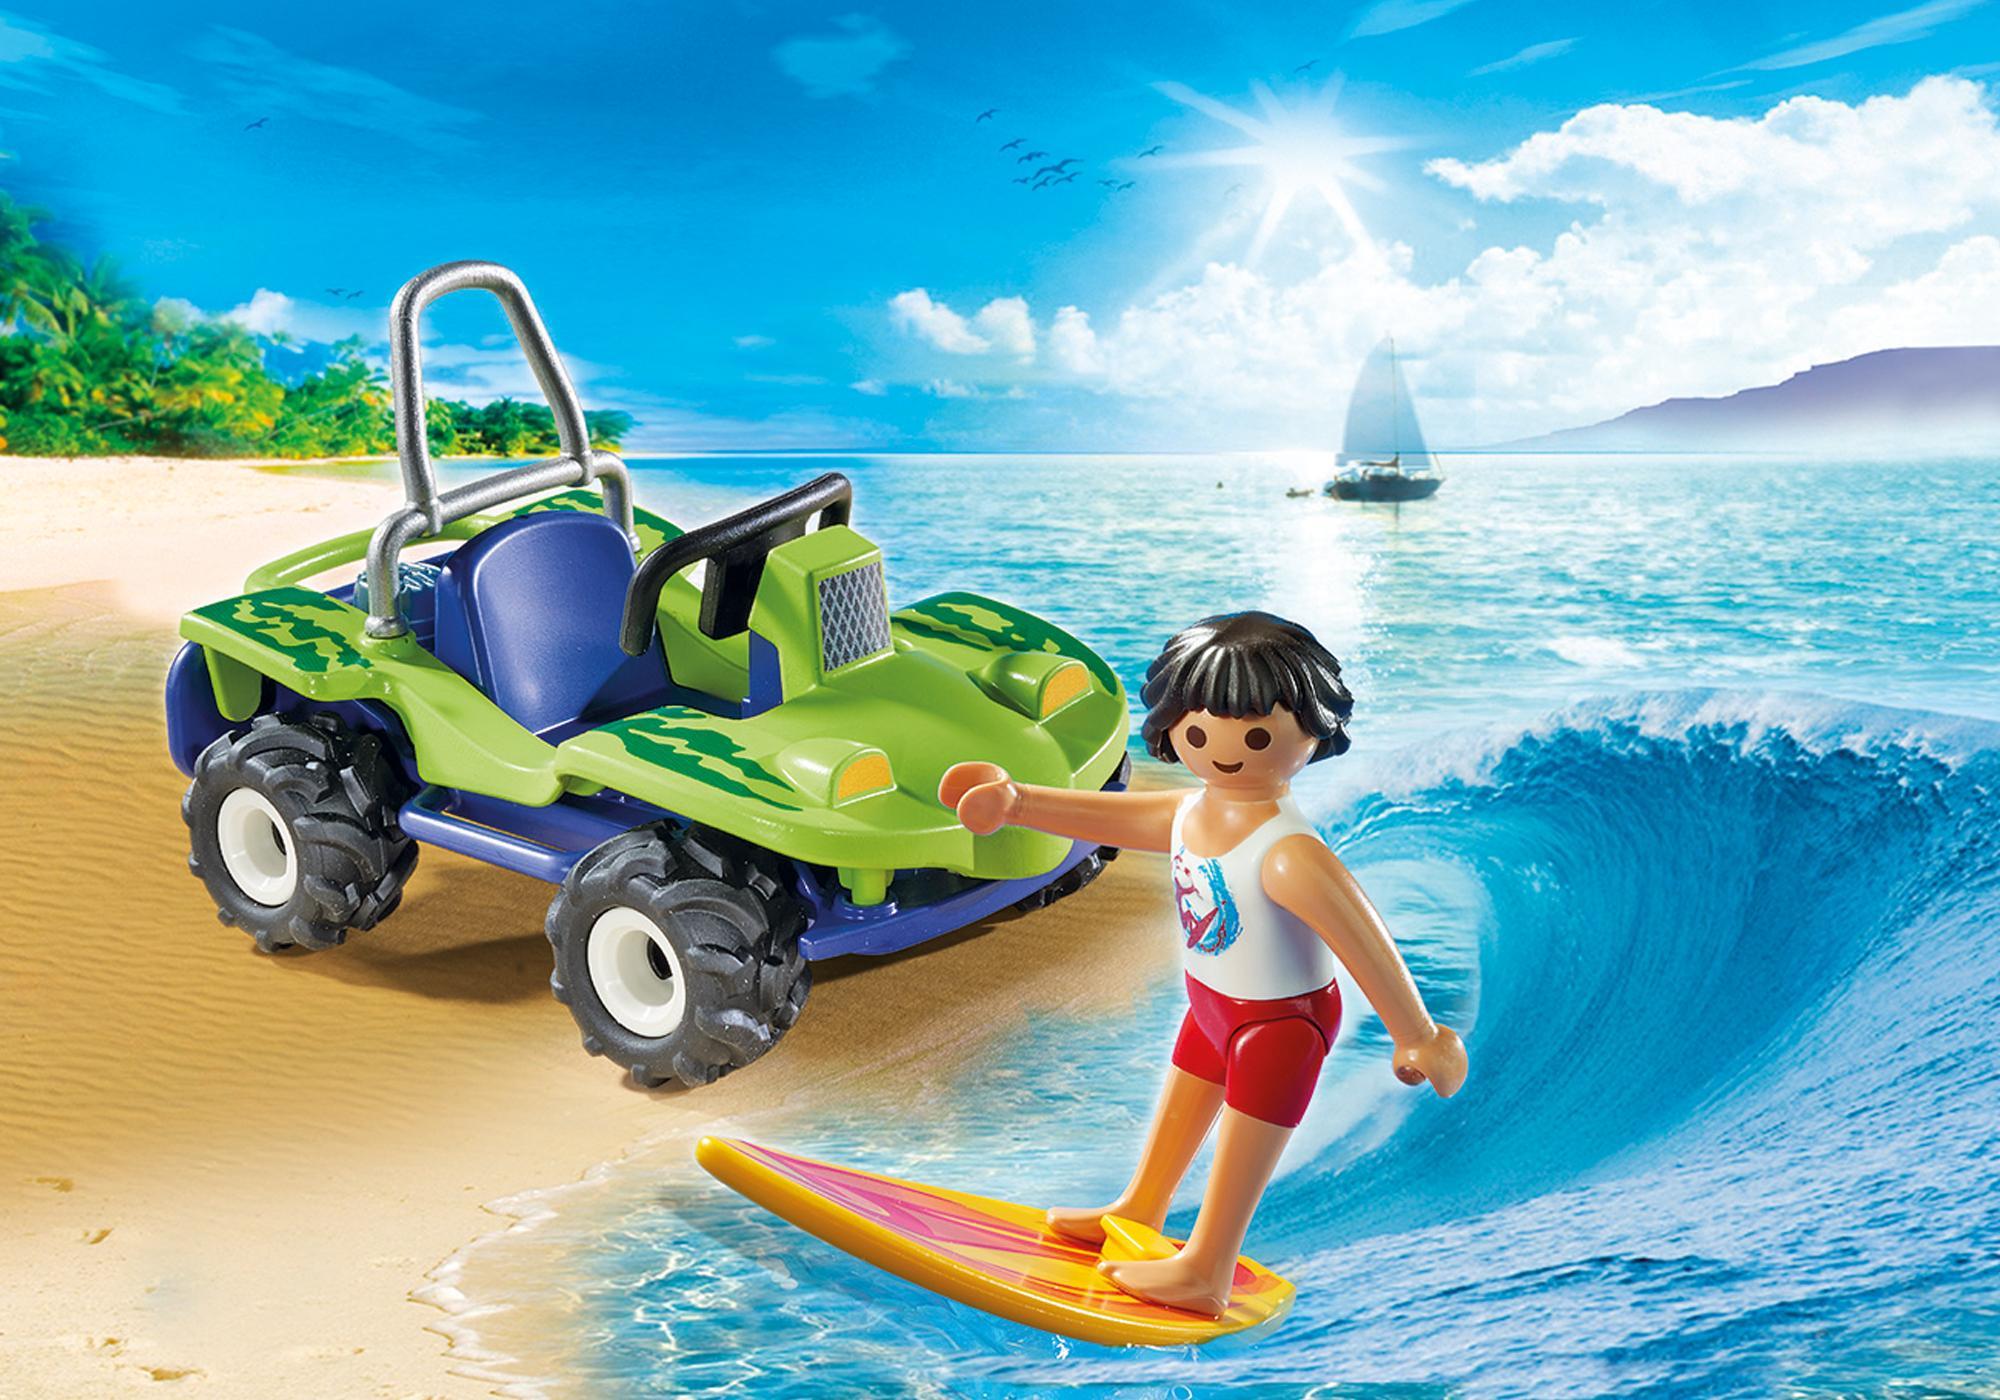 http://media.playmobil.com/i/playmobil/6982_product_detail/Surfer z buggy